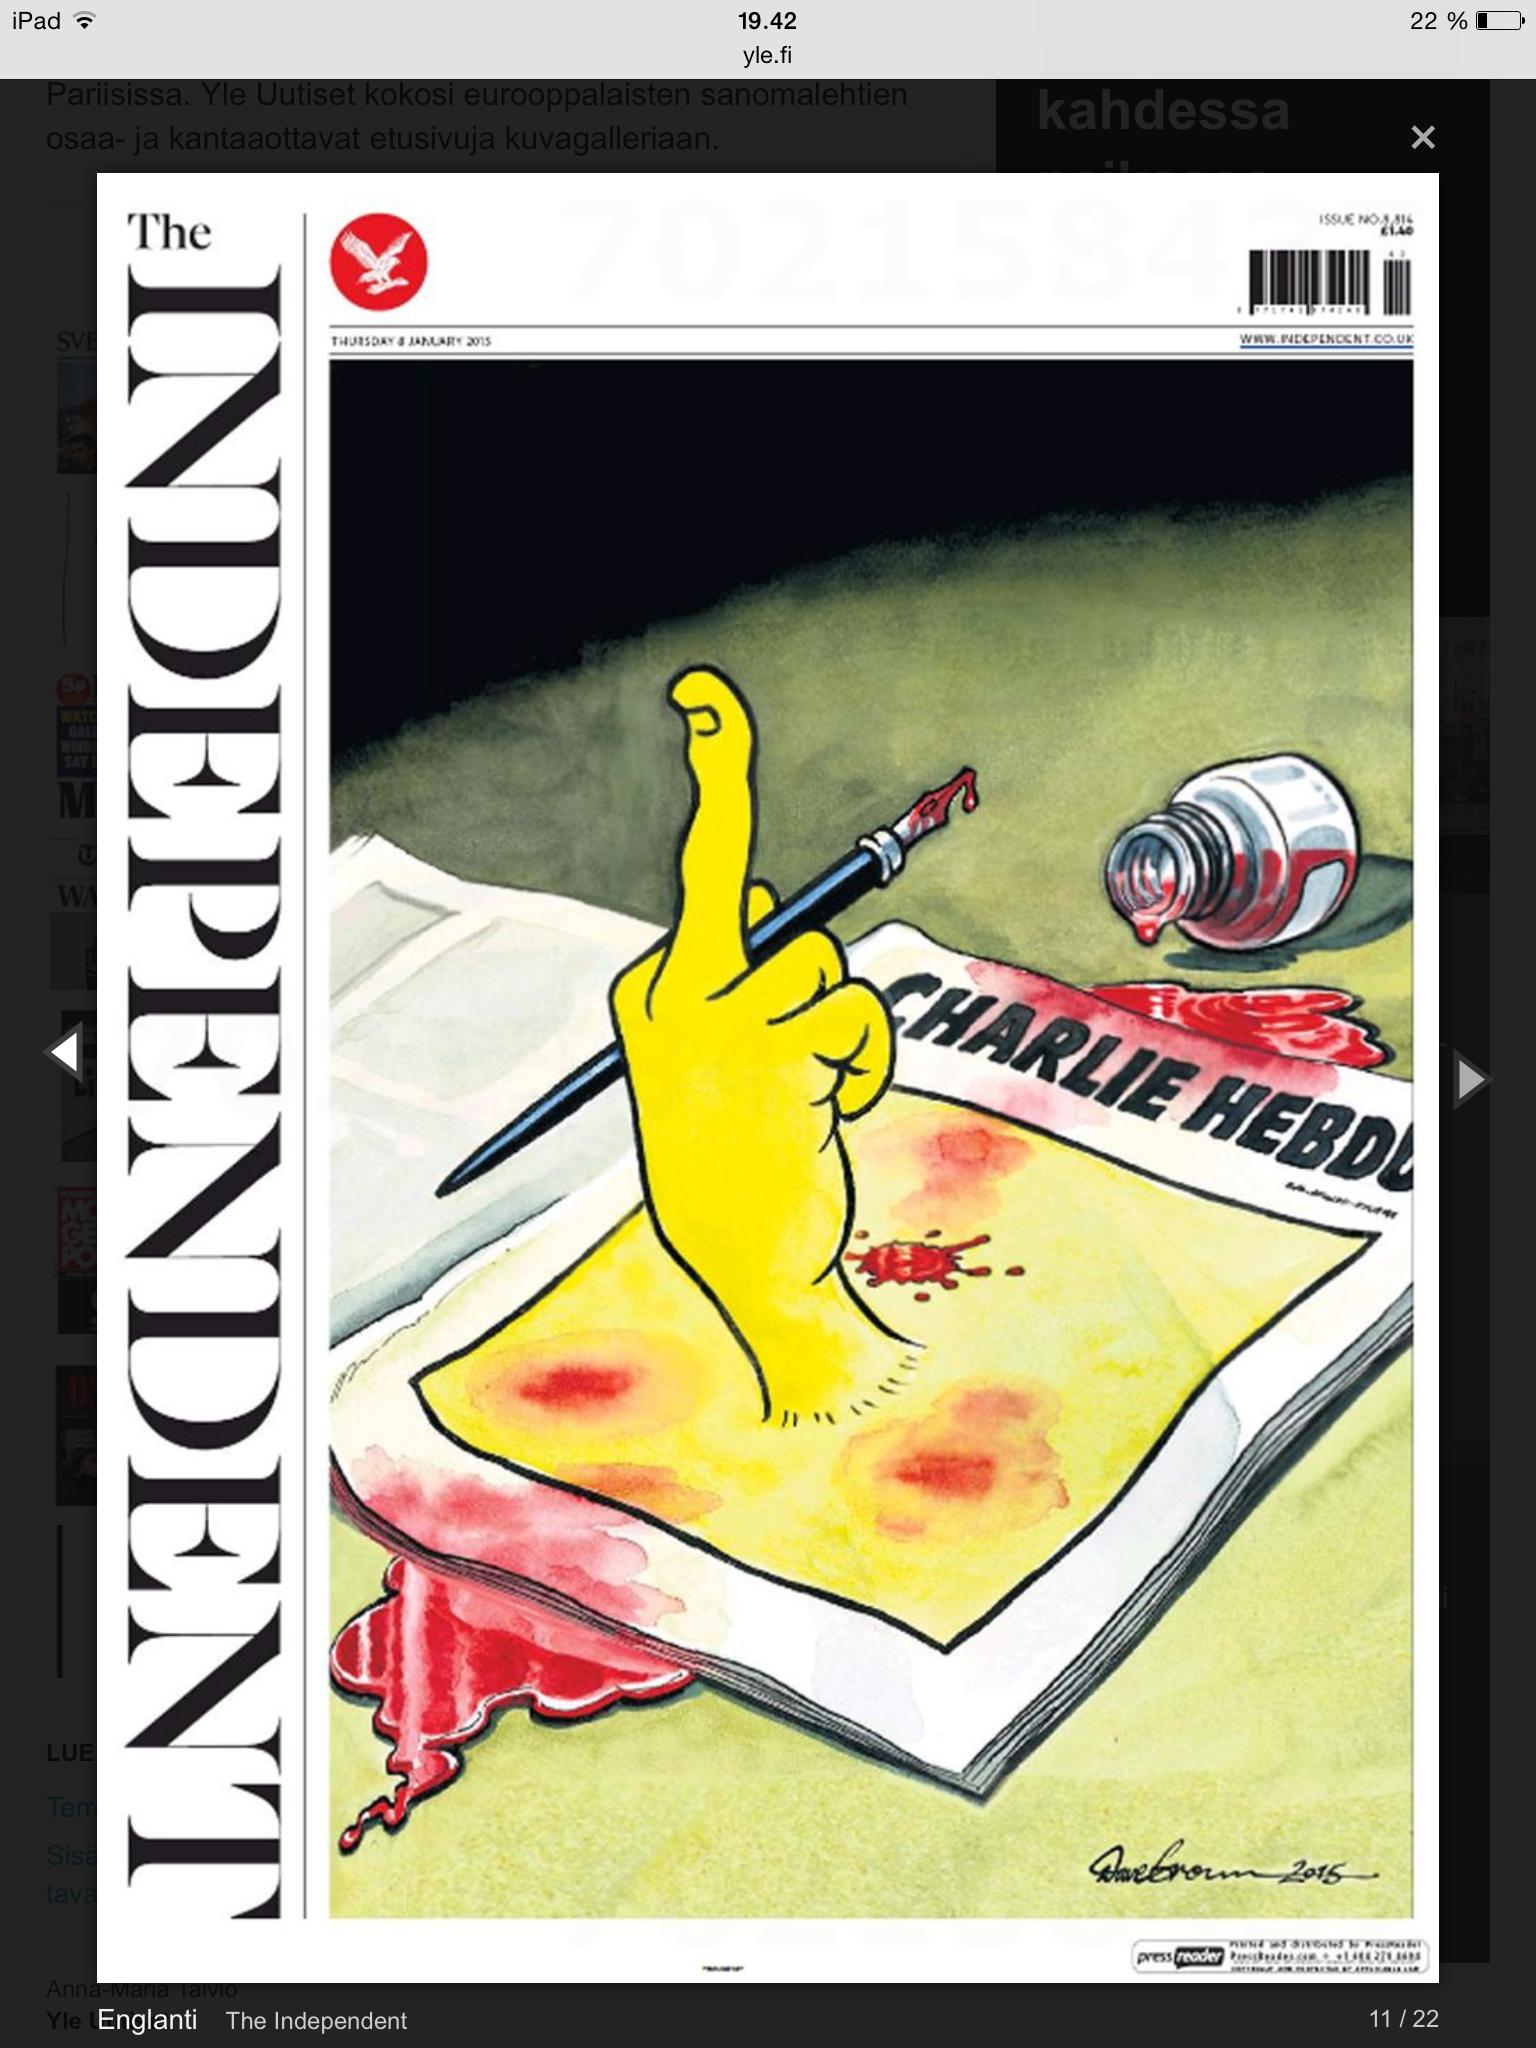 Pin By Titta Suvanto On Cartoon Sarjakuva Pinterest Cartoon - 24 powerful cartoon responses charlie hebdo shooting